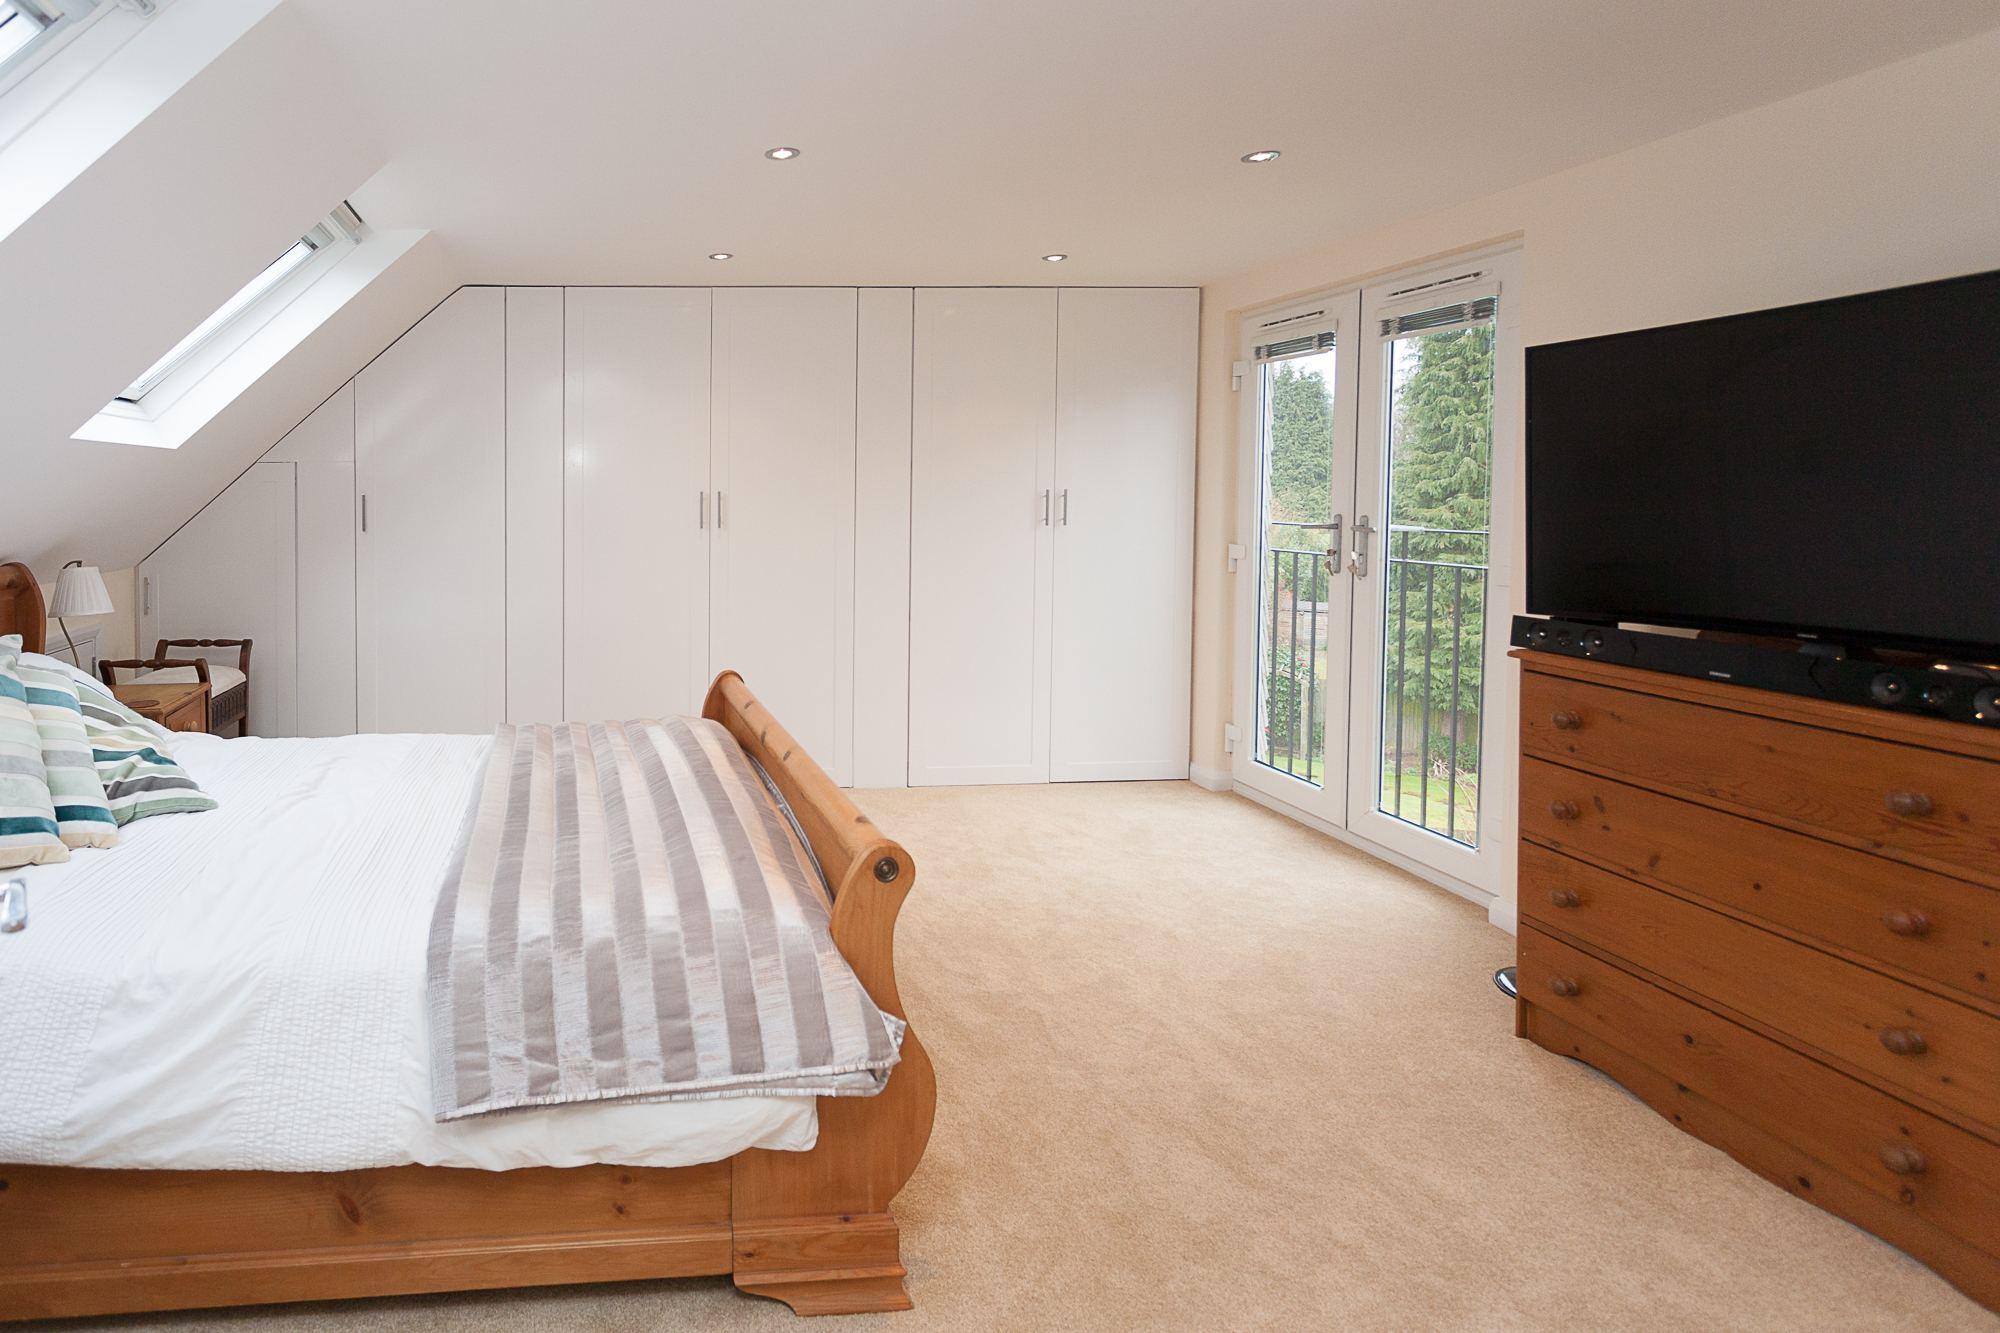 Tony trisha borgnis skylofts for Skylofts 1 bedroom loft suite